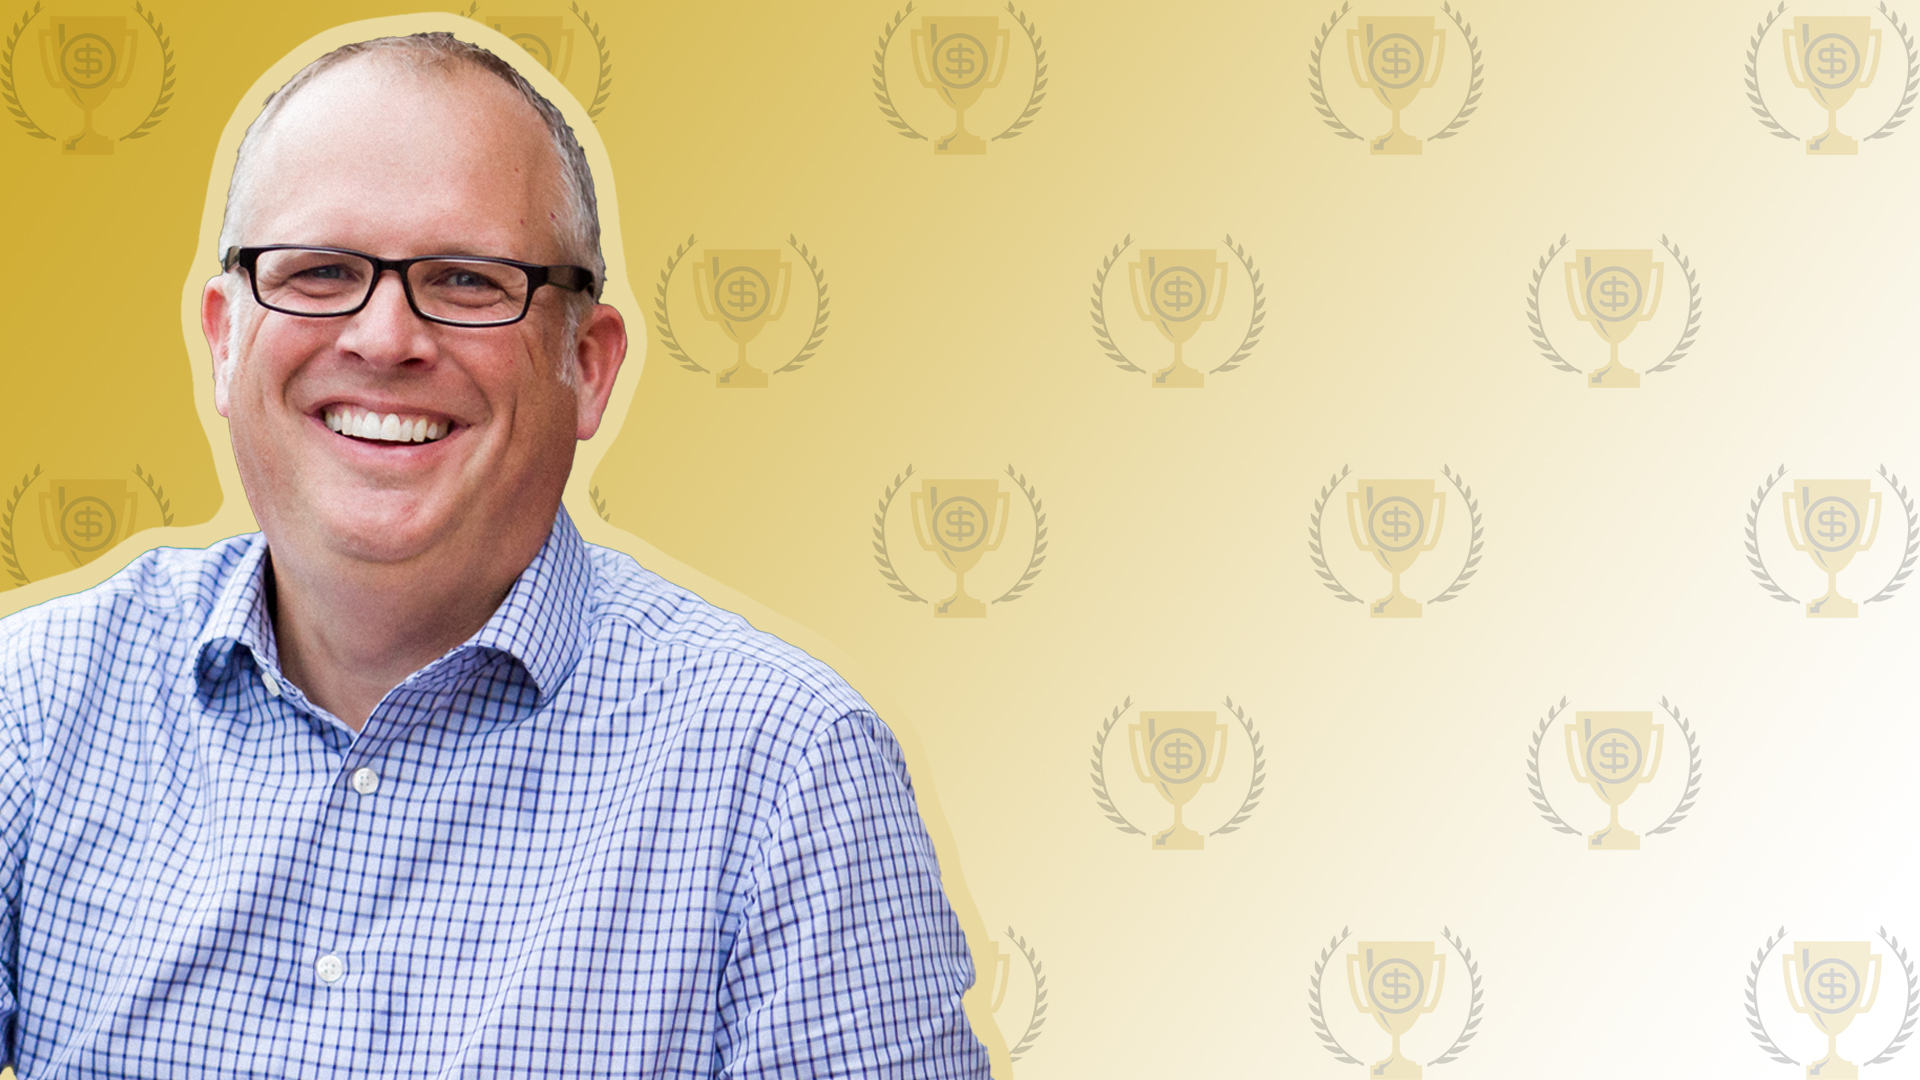 Joe Saul-Sehy Plutus Awards Podcast